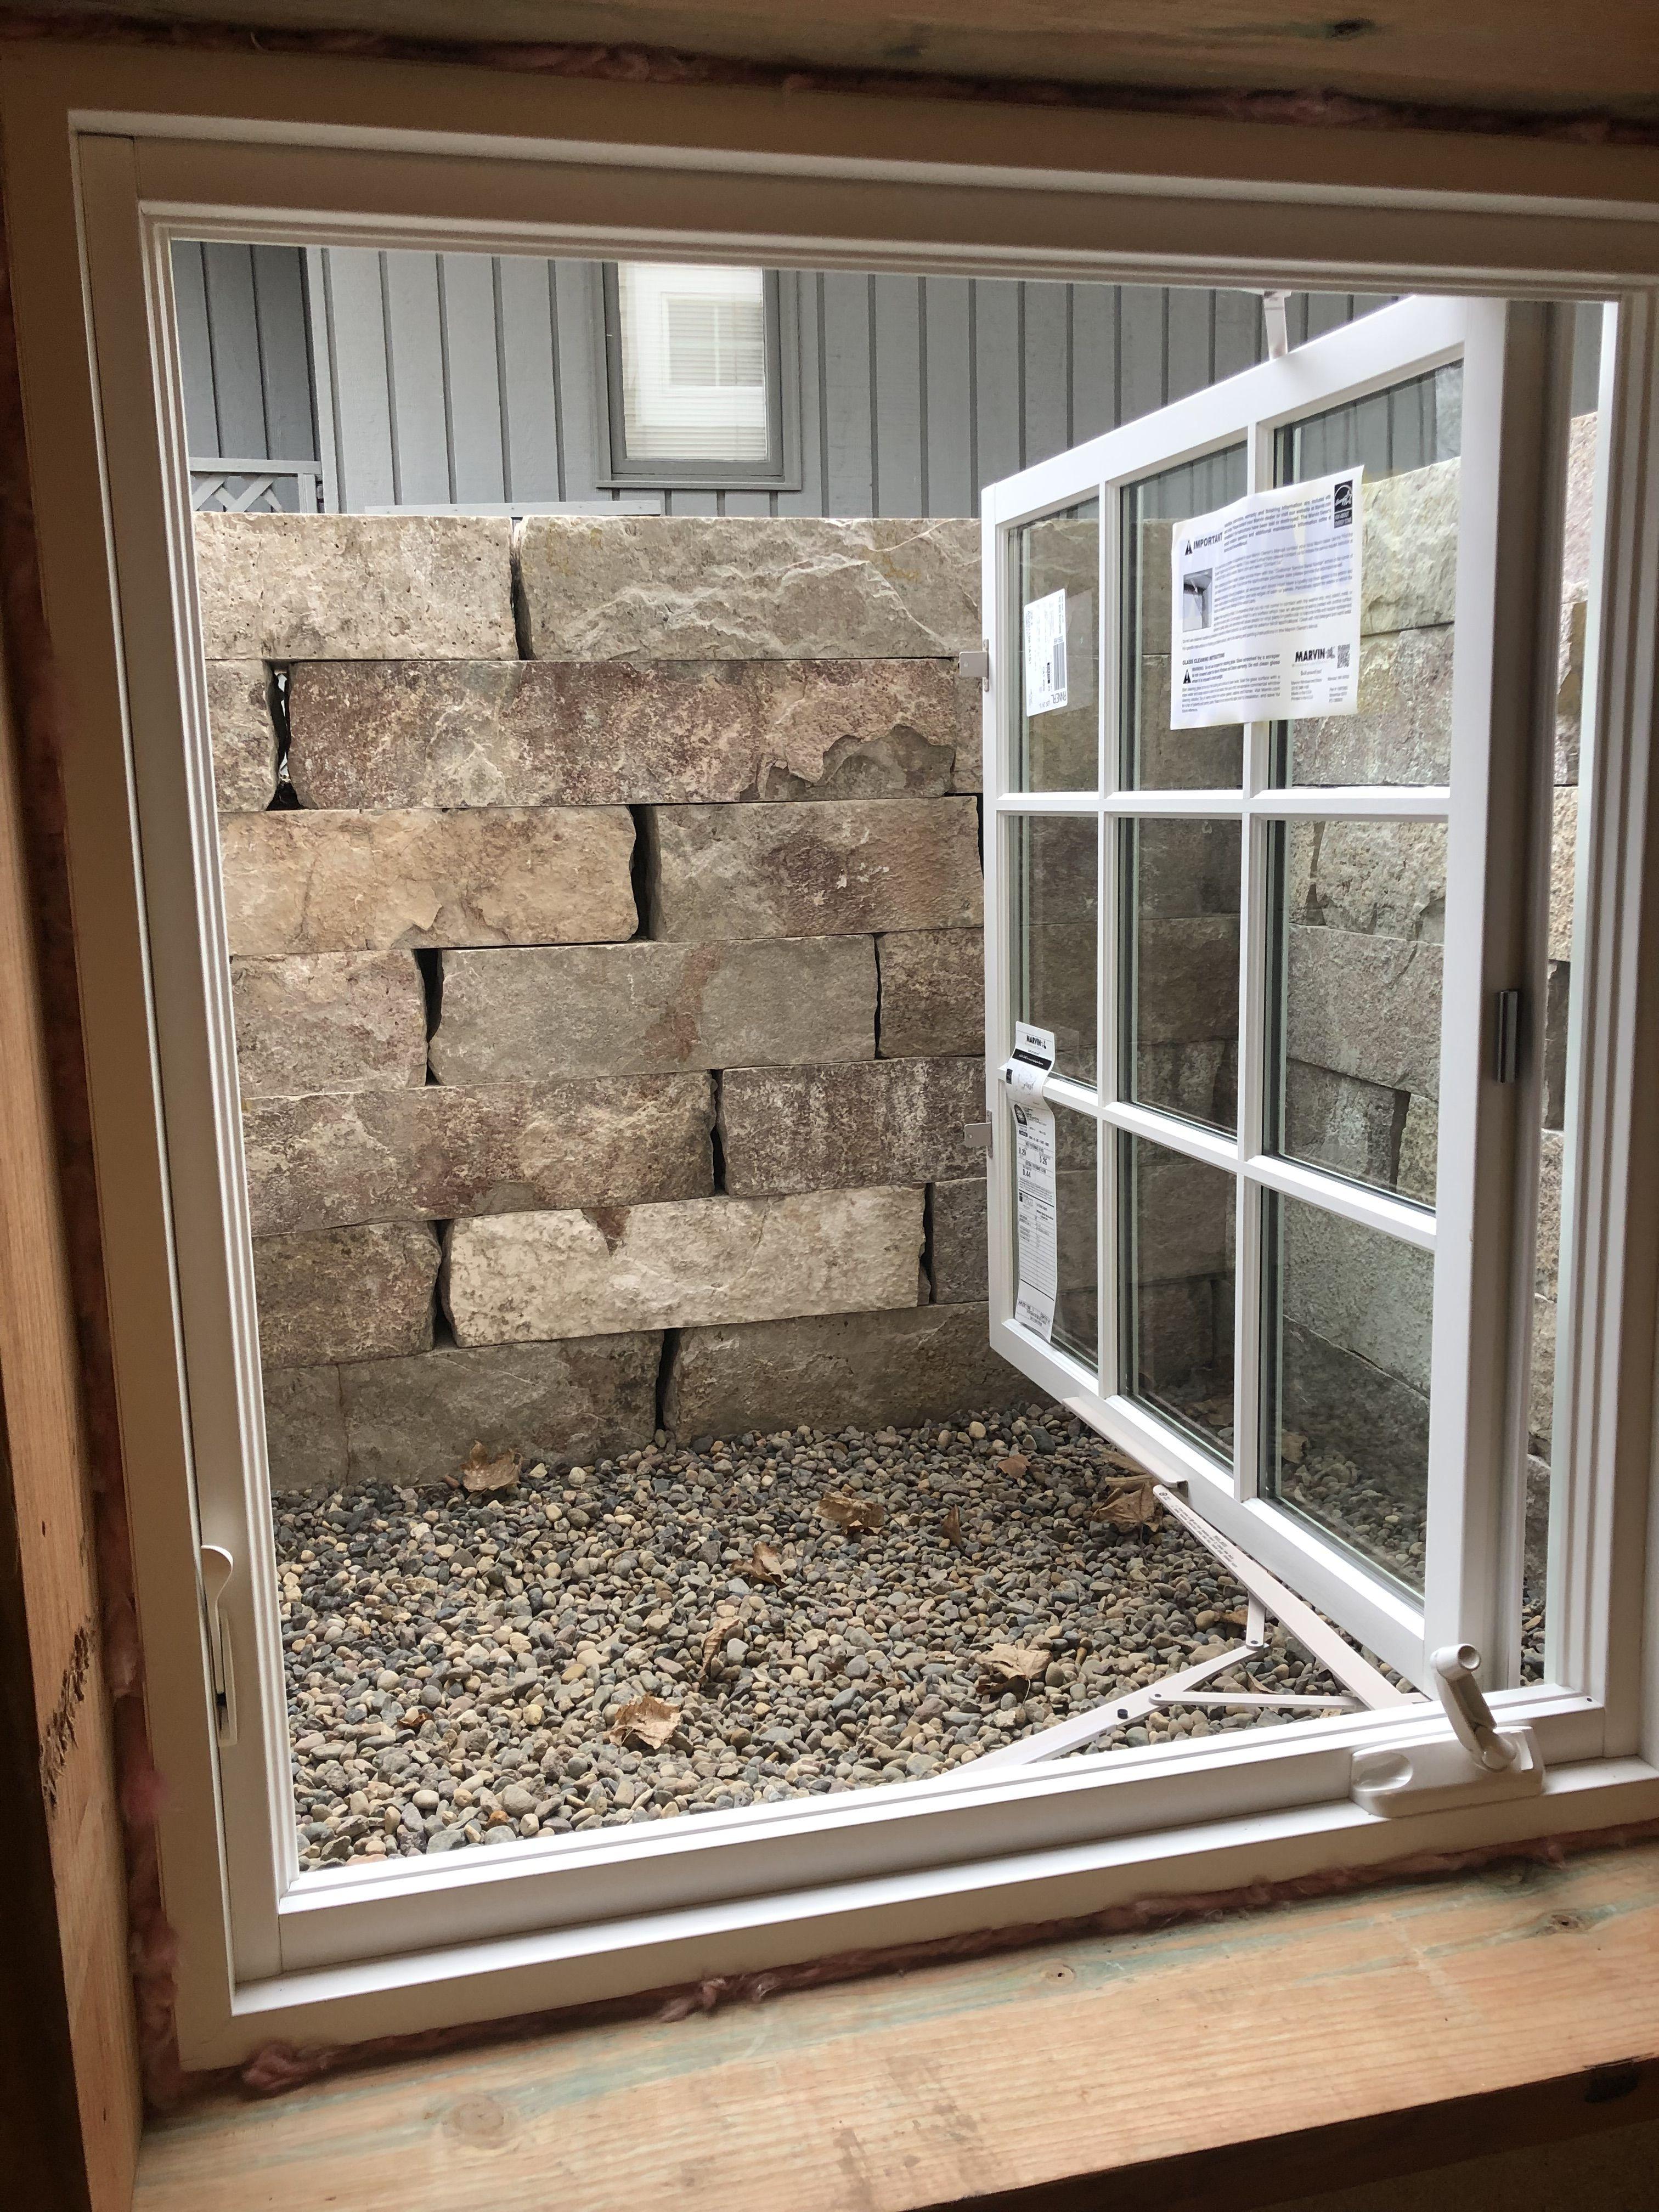 Natural Stone Egress Window Well Egress Window Well Egress Window Egress Window Landscaping